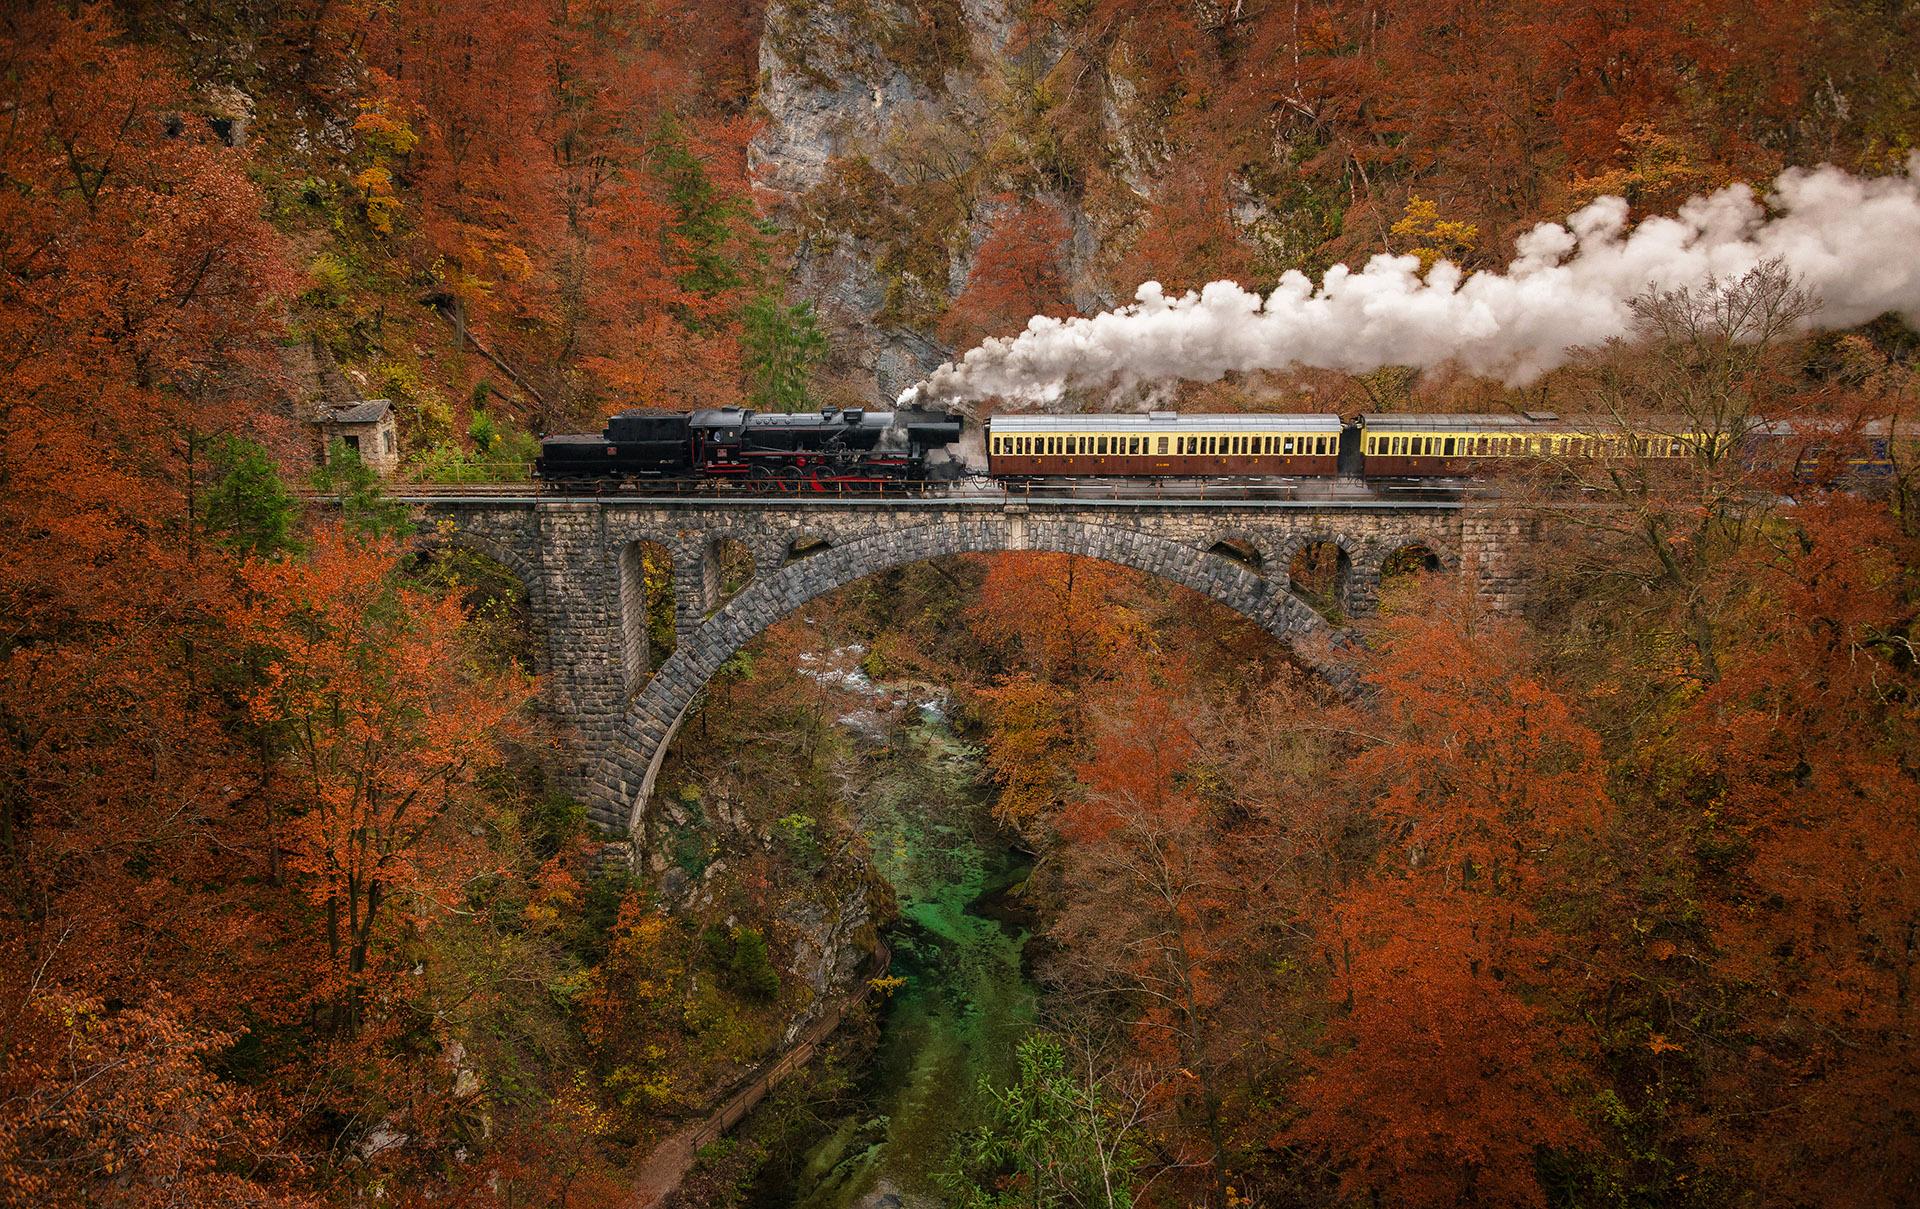 Muzejski vlak nad Sotesko Vintgar